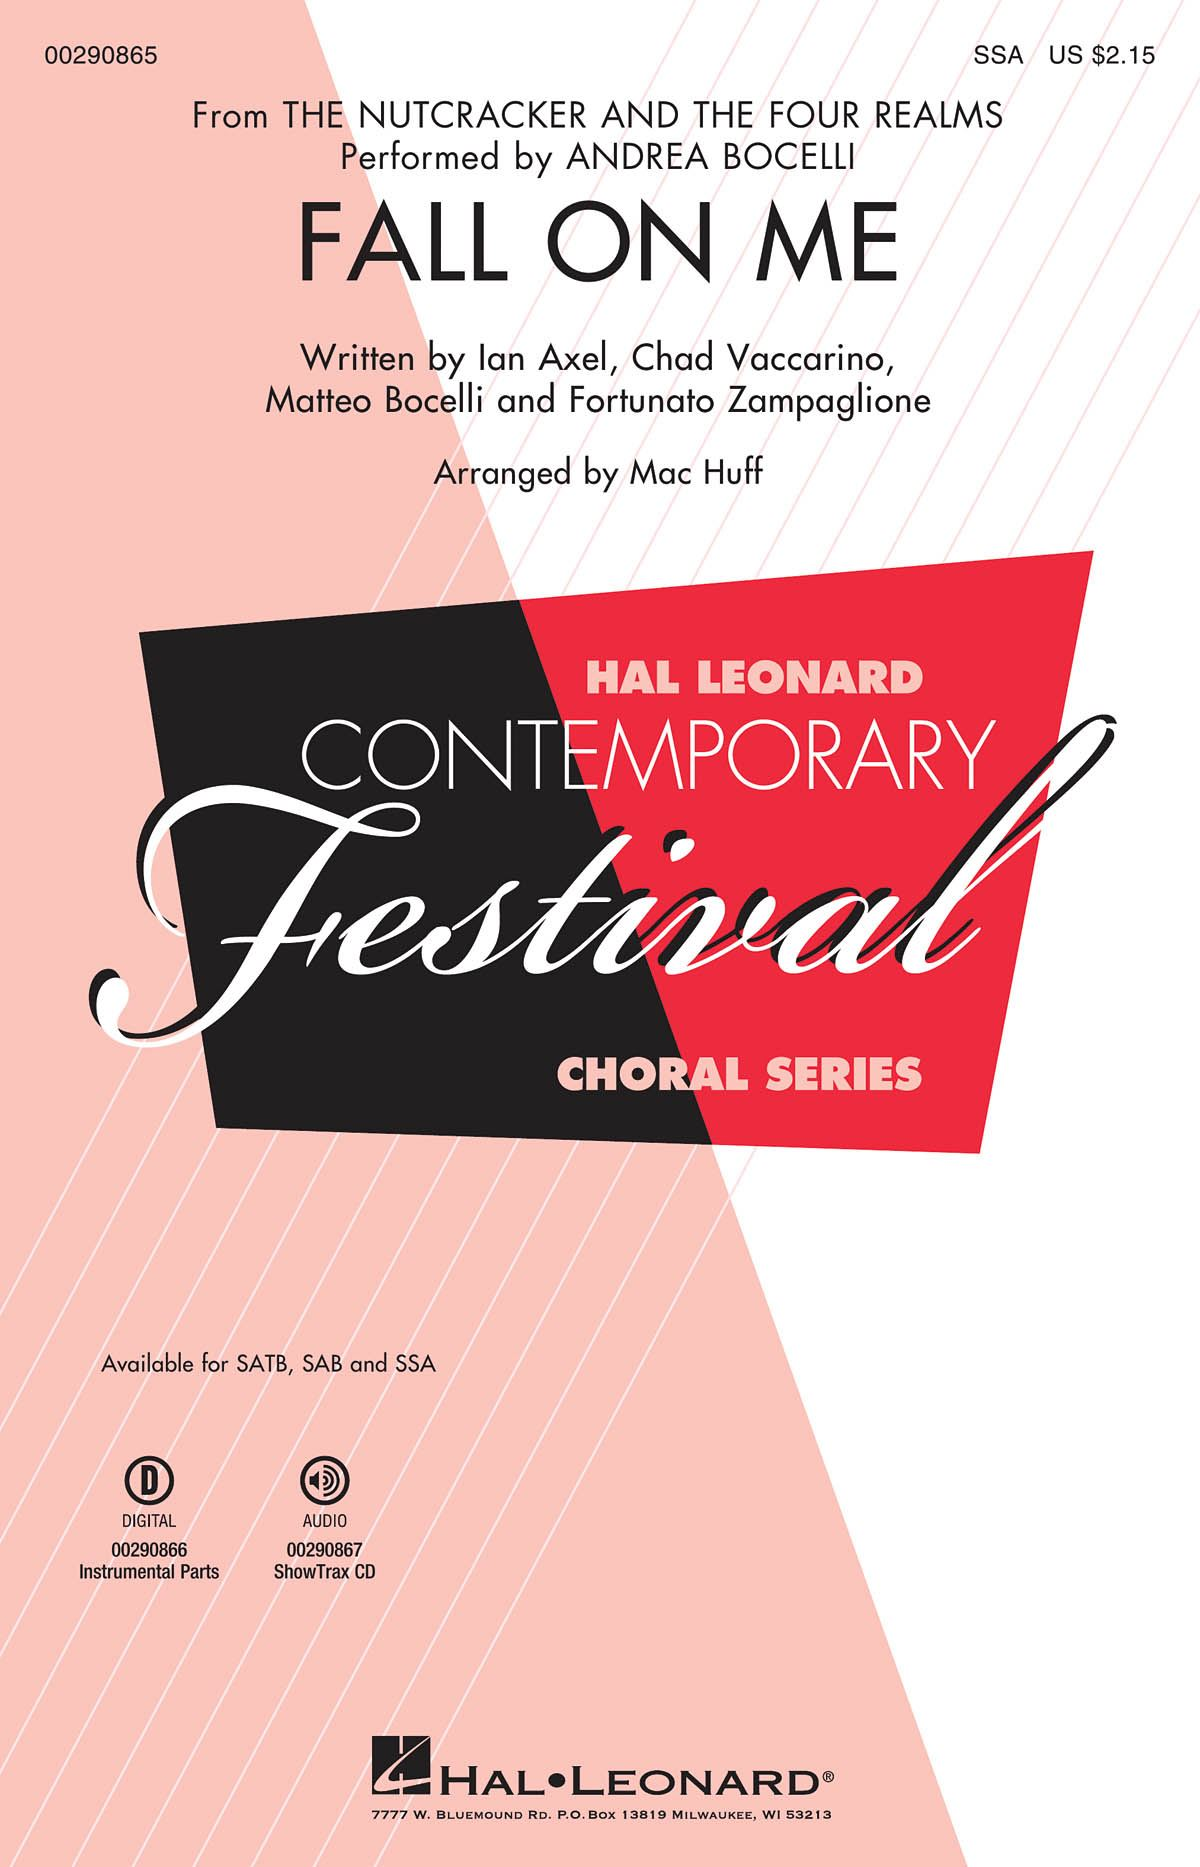 Andrea Bocelli: Fall on Me: Upper Voices a Cappella: Vocal Score